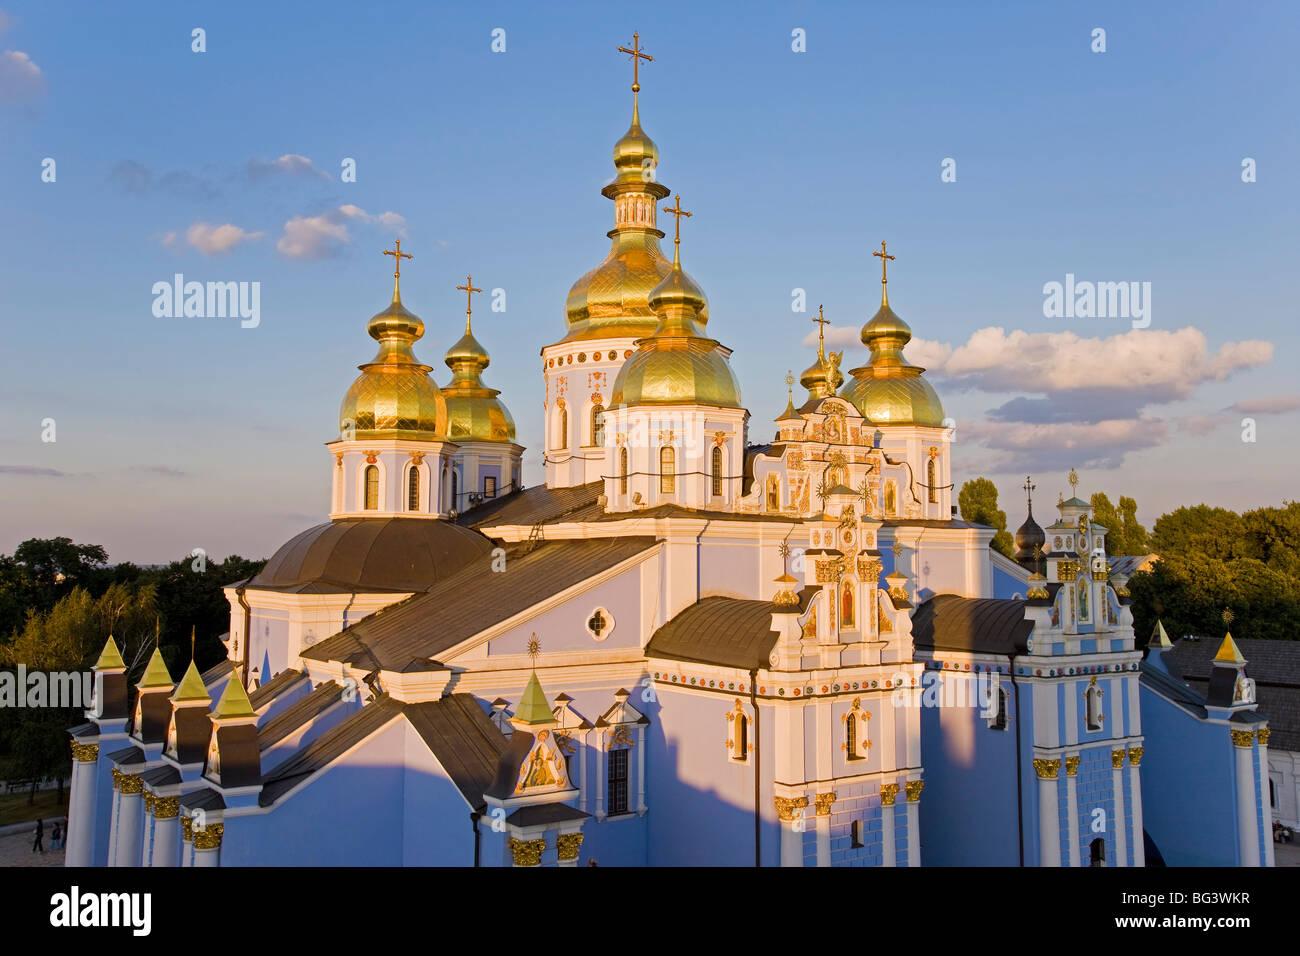 St. Michael's Monastery, Kiev, Ukraine, Europe - Stock Image